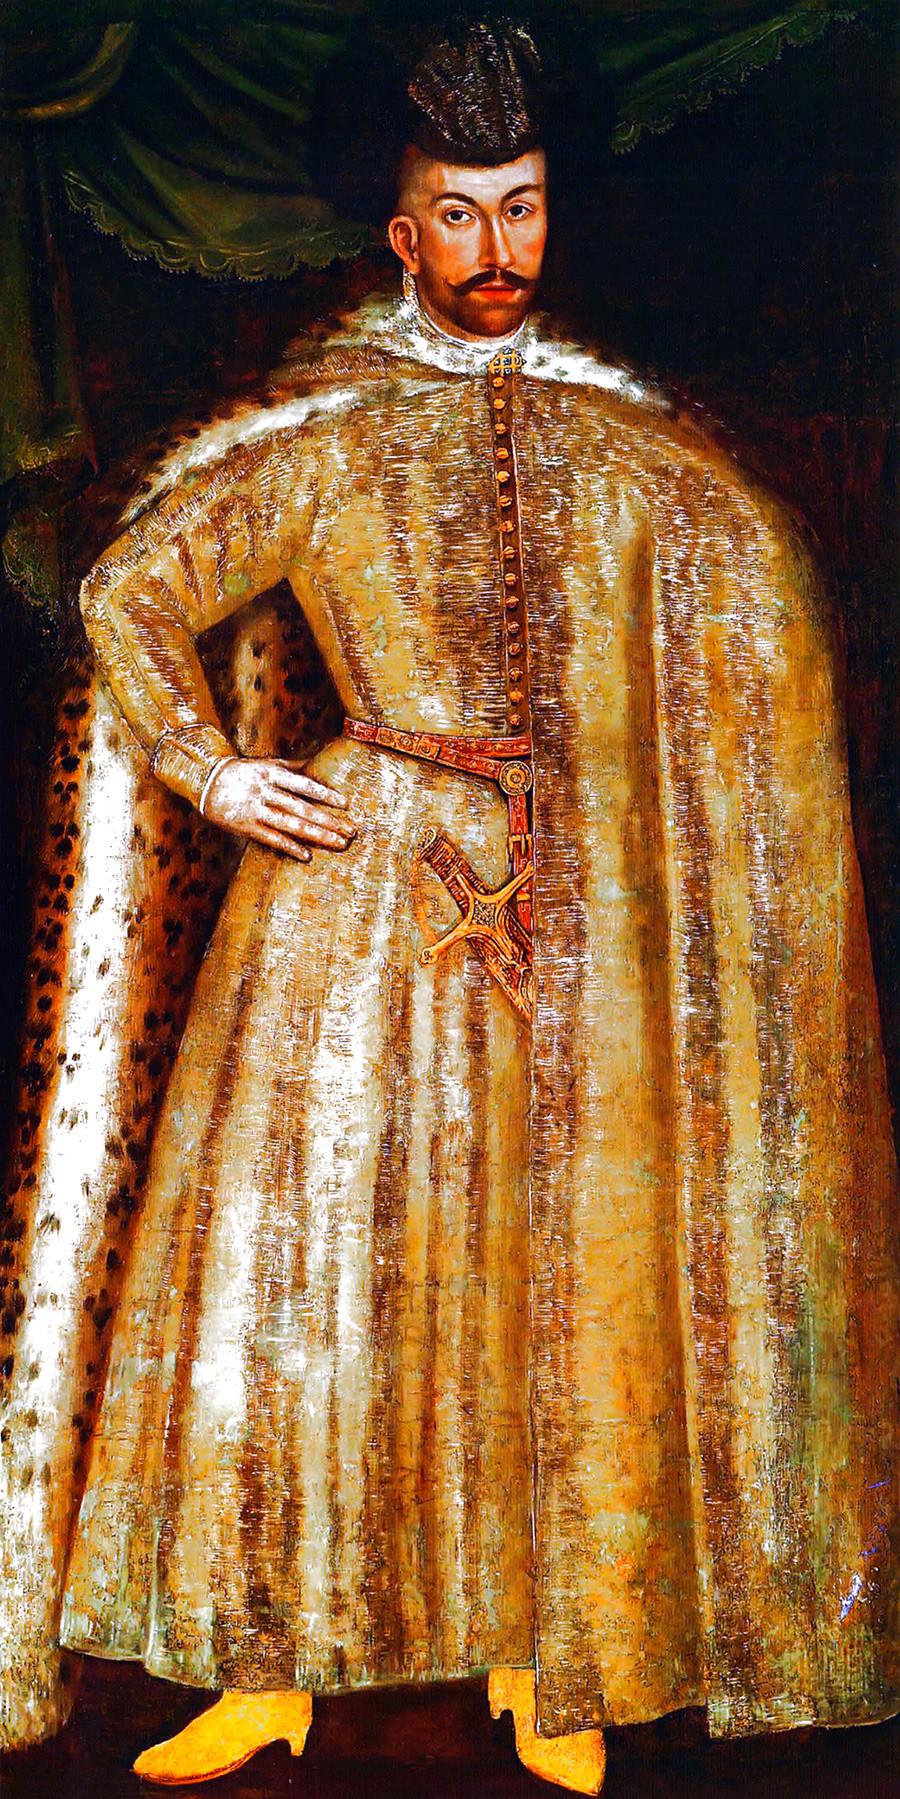 Siméon Bekboulatovitch